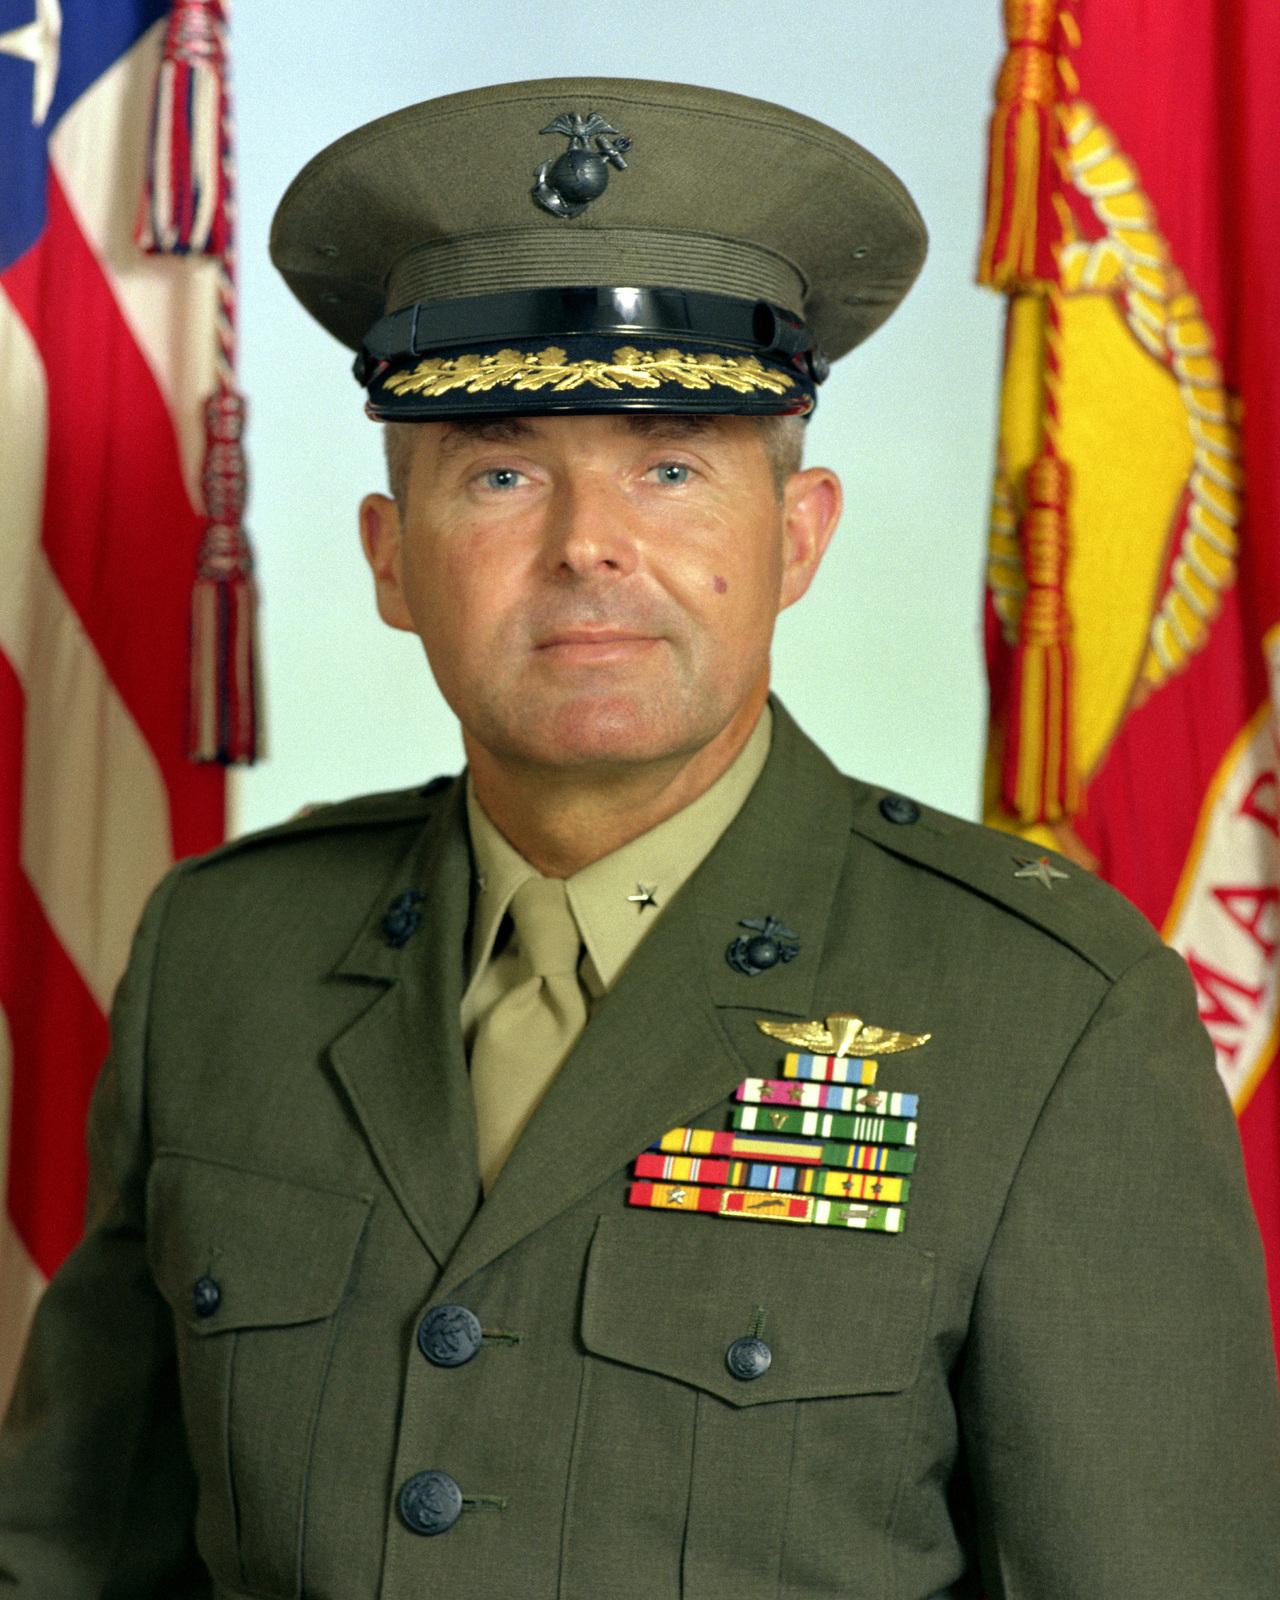 BGEN Michael K. Sheridan, USMC (covered)